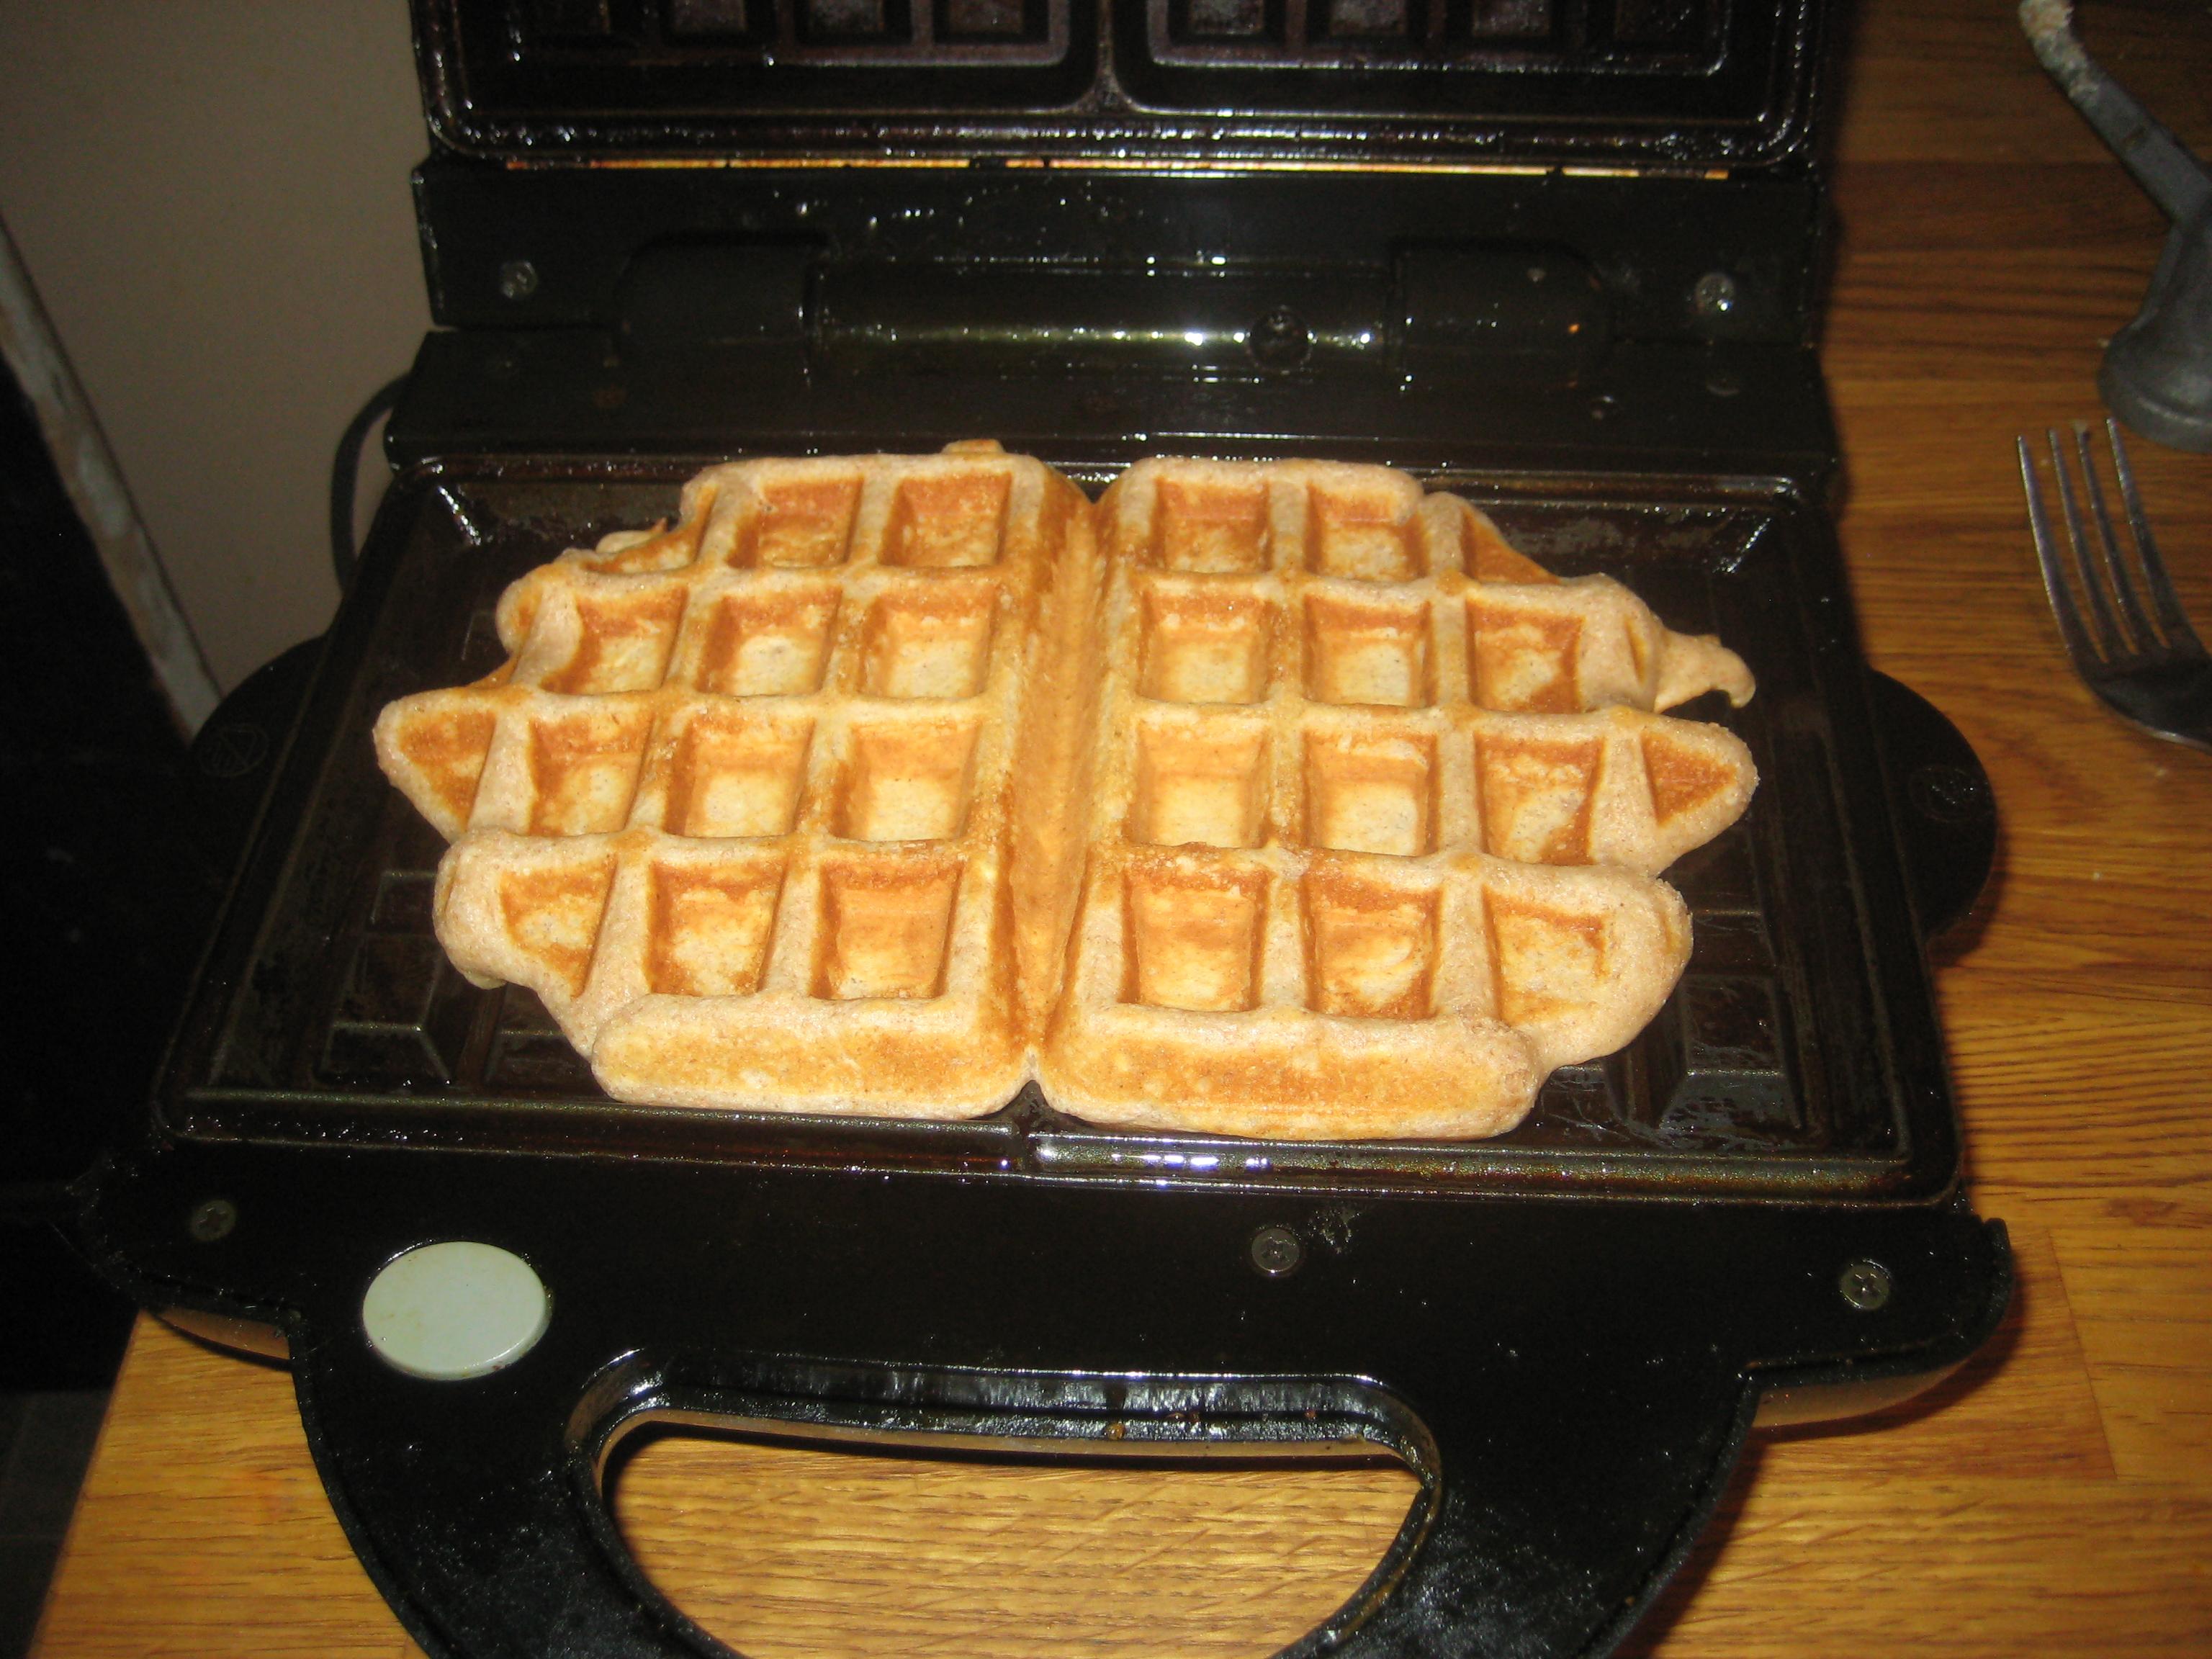 Whole Wheat Peanut Butter Waffles